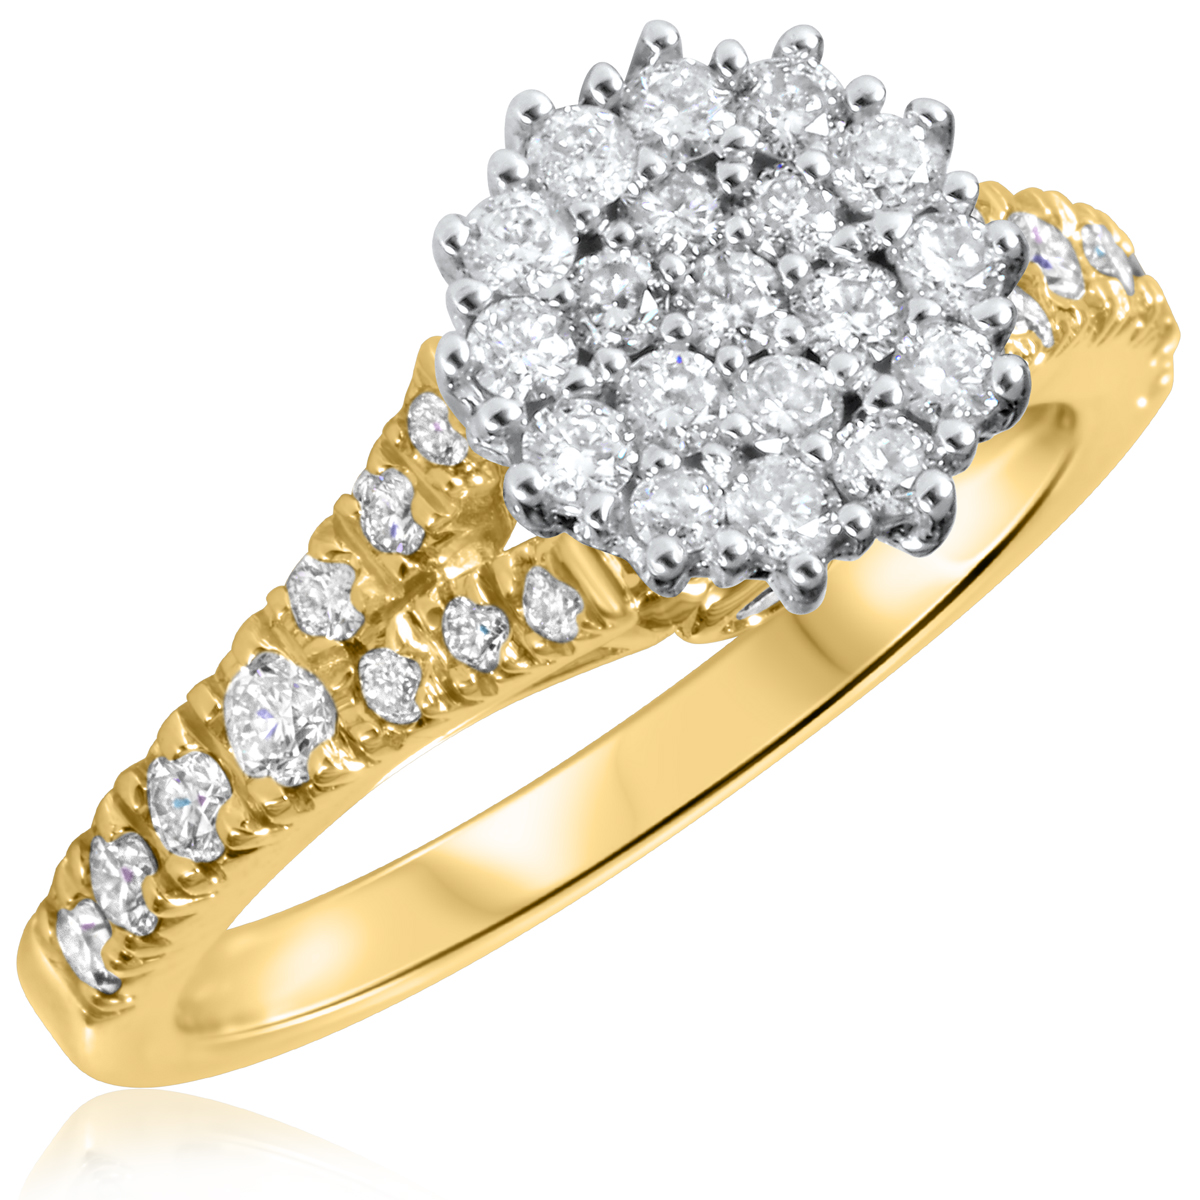 7/8 CT. T.W. Diamond Ladies Engagement Ring 14K Yellow Gold- Size 8